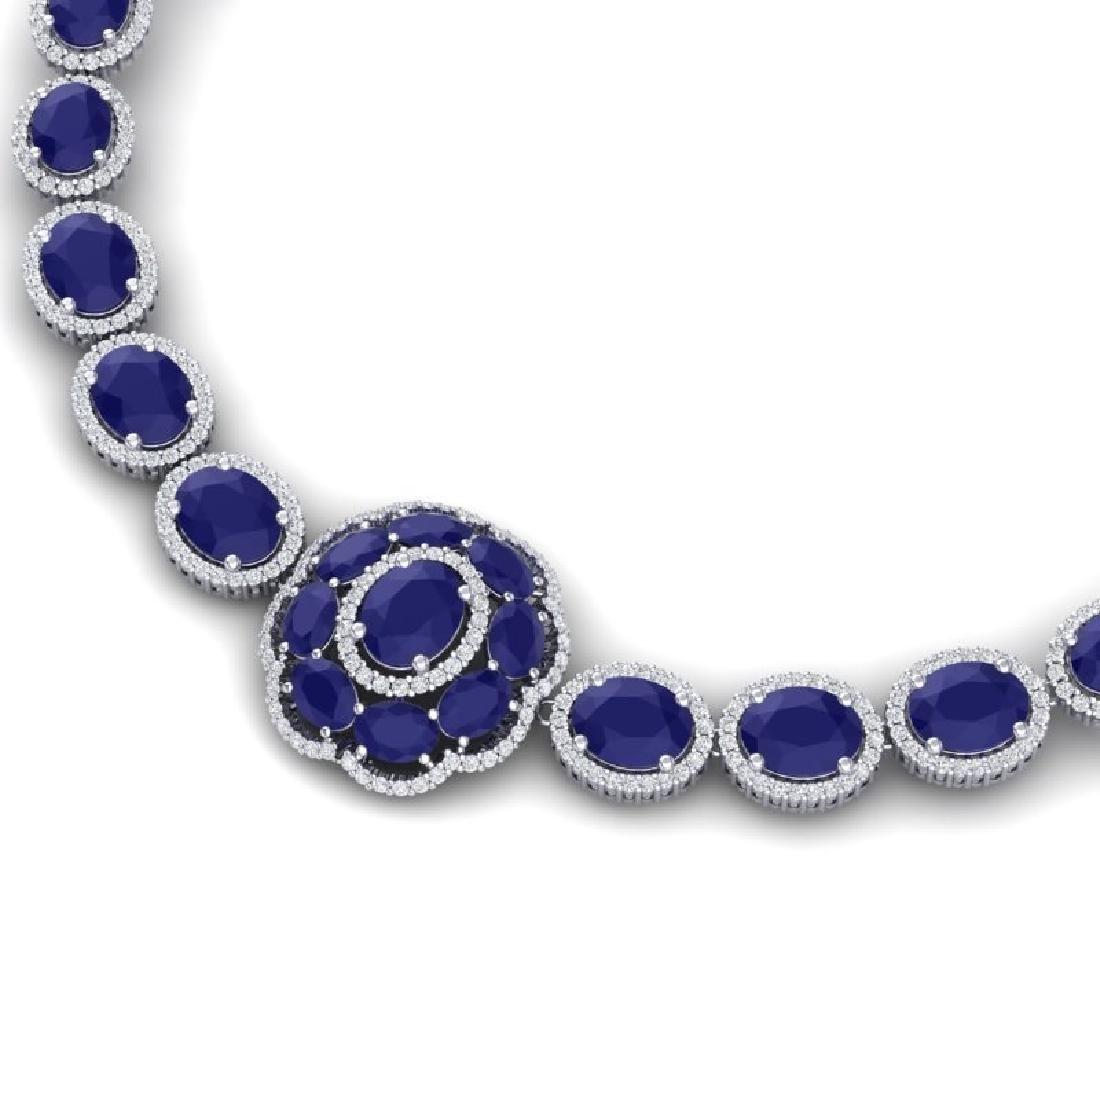 58.33 CTW Royalty Sapphire & VS Diamond Necklace 18K